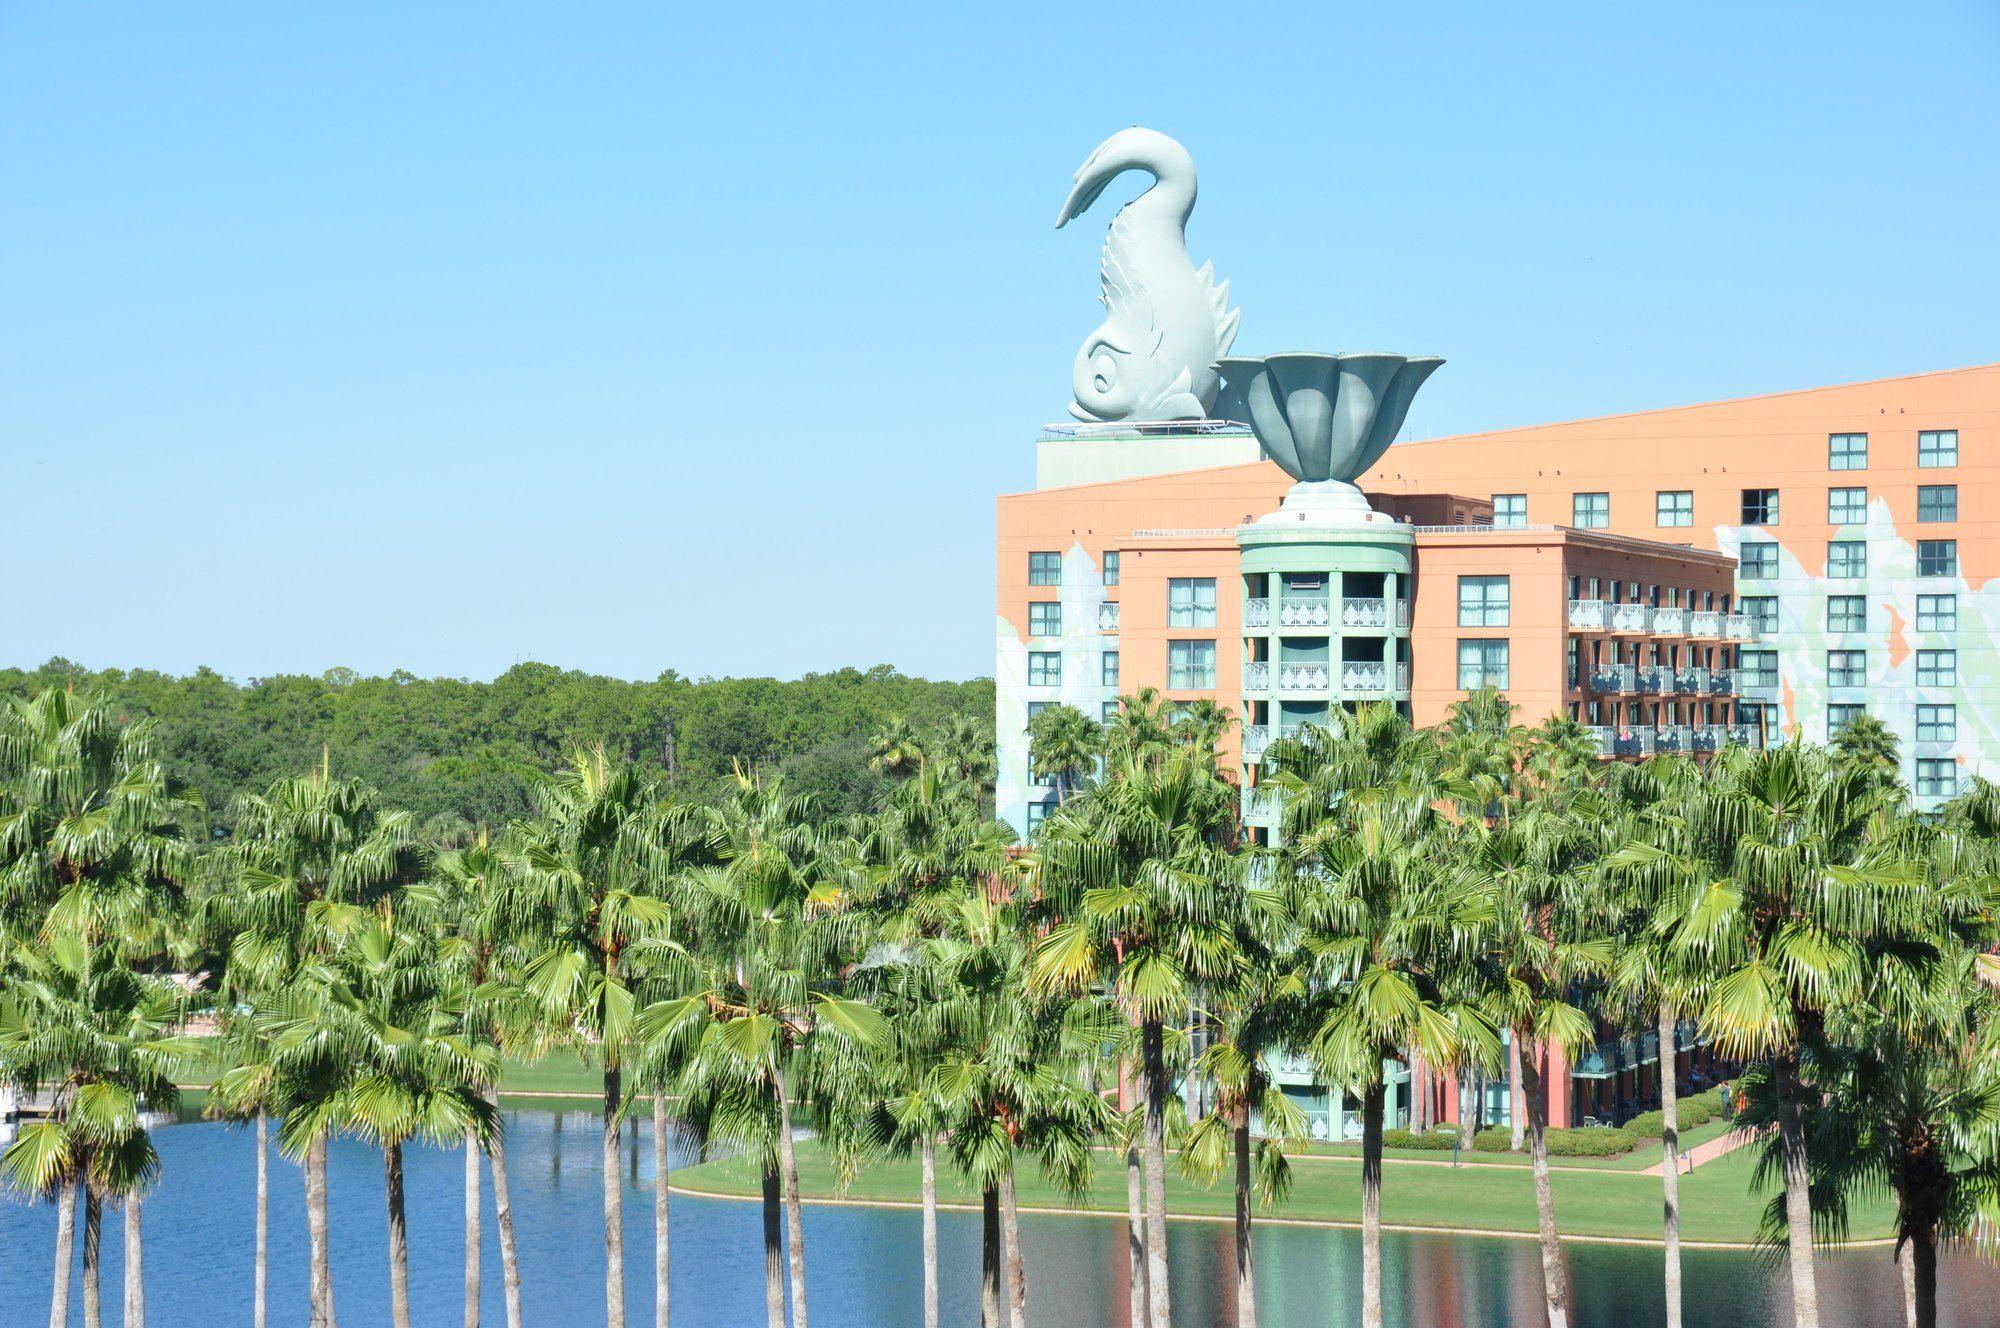 The Disney Swan